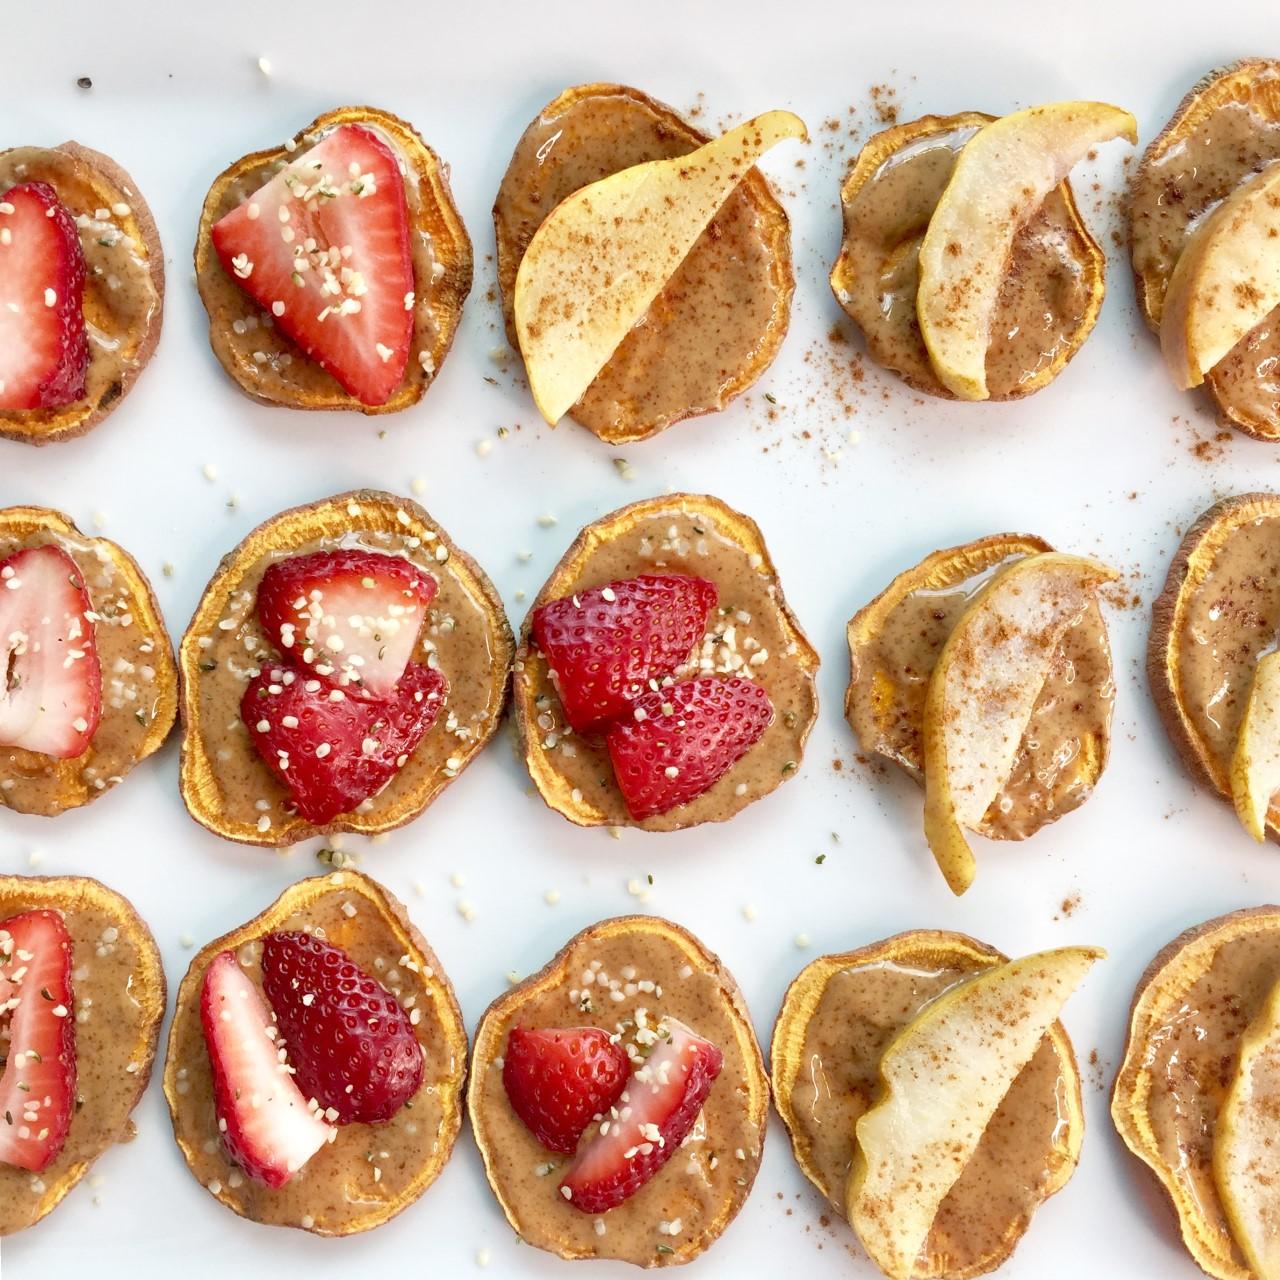 sweet-potato-treats.jpg